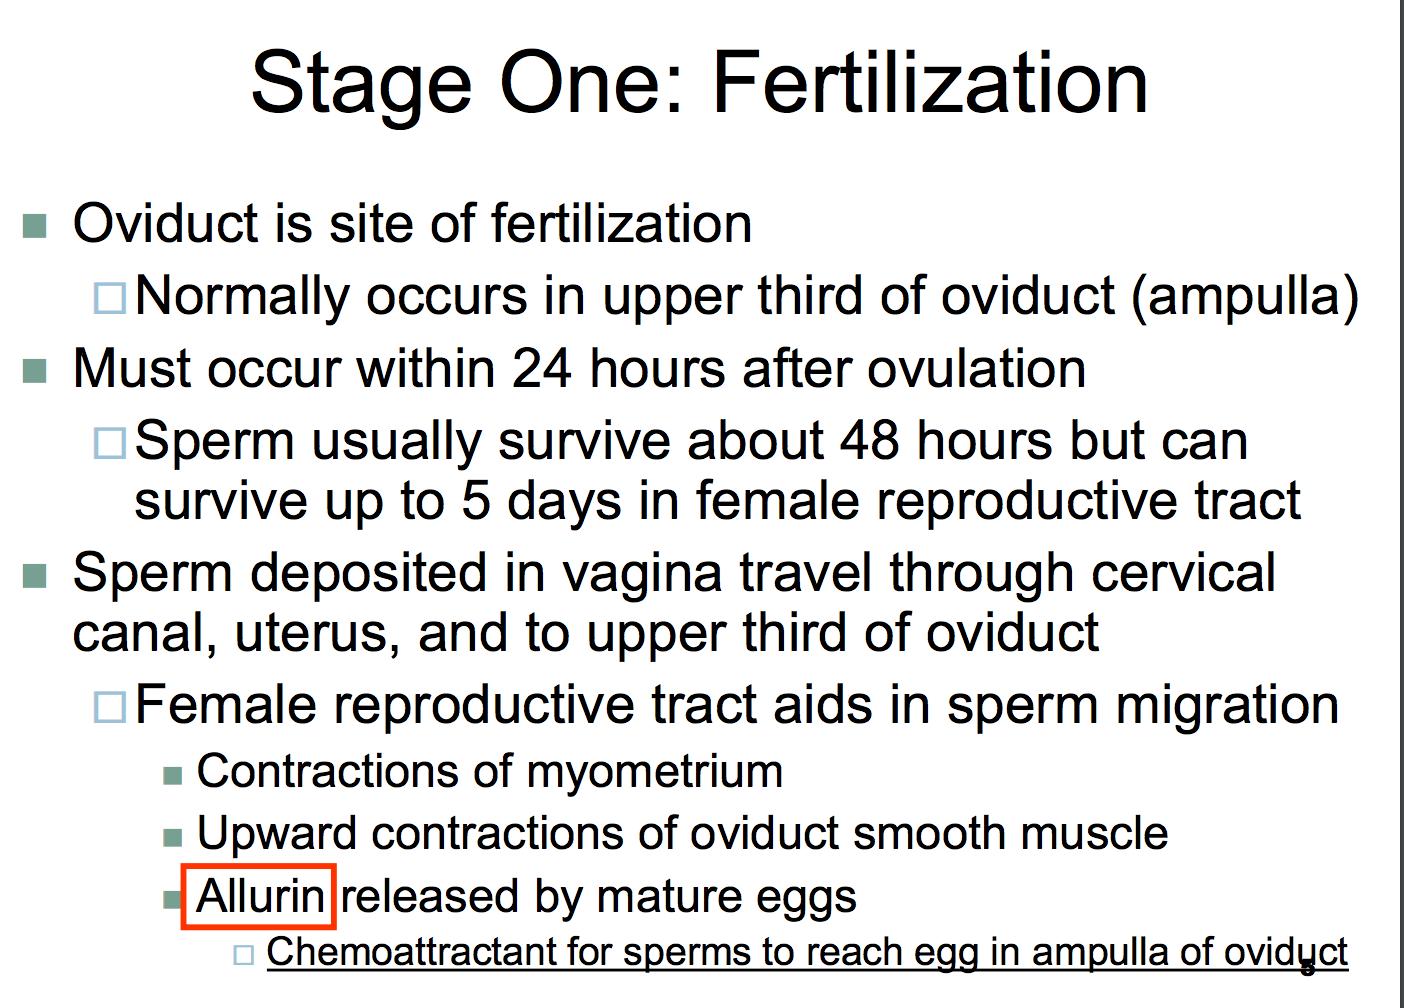 Sperm count 24 hours after ejaculation